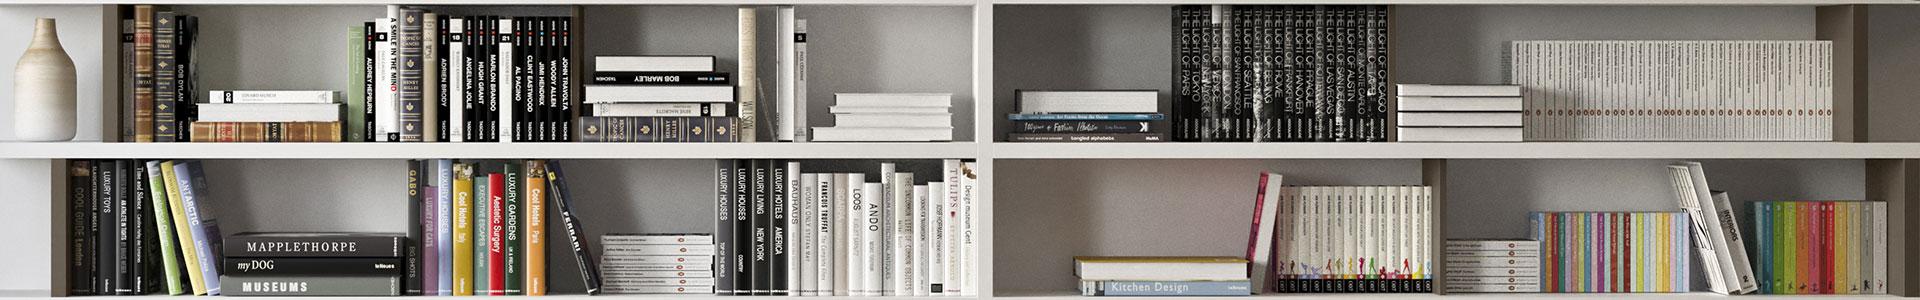 Librerie moderne catalogo online completo e prezzi in for Librerie vendita online